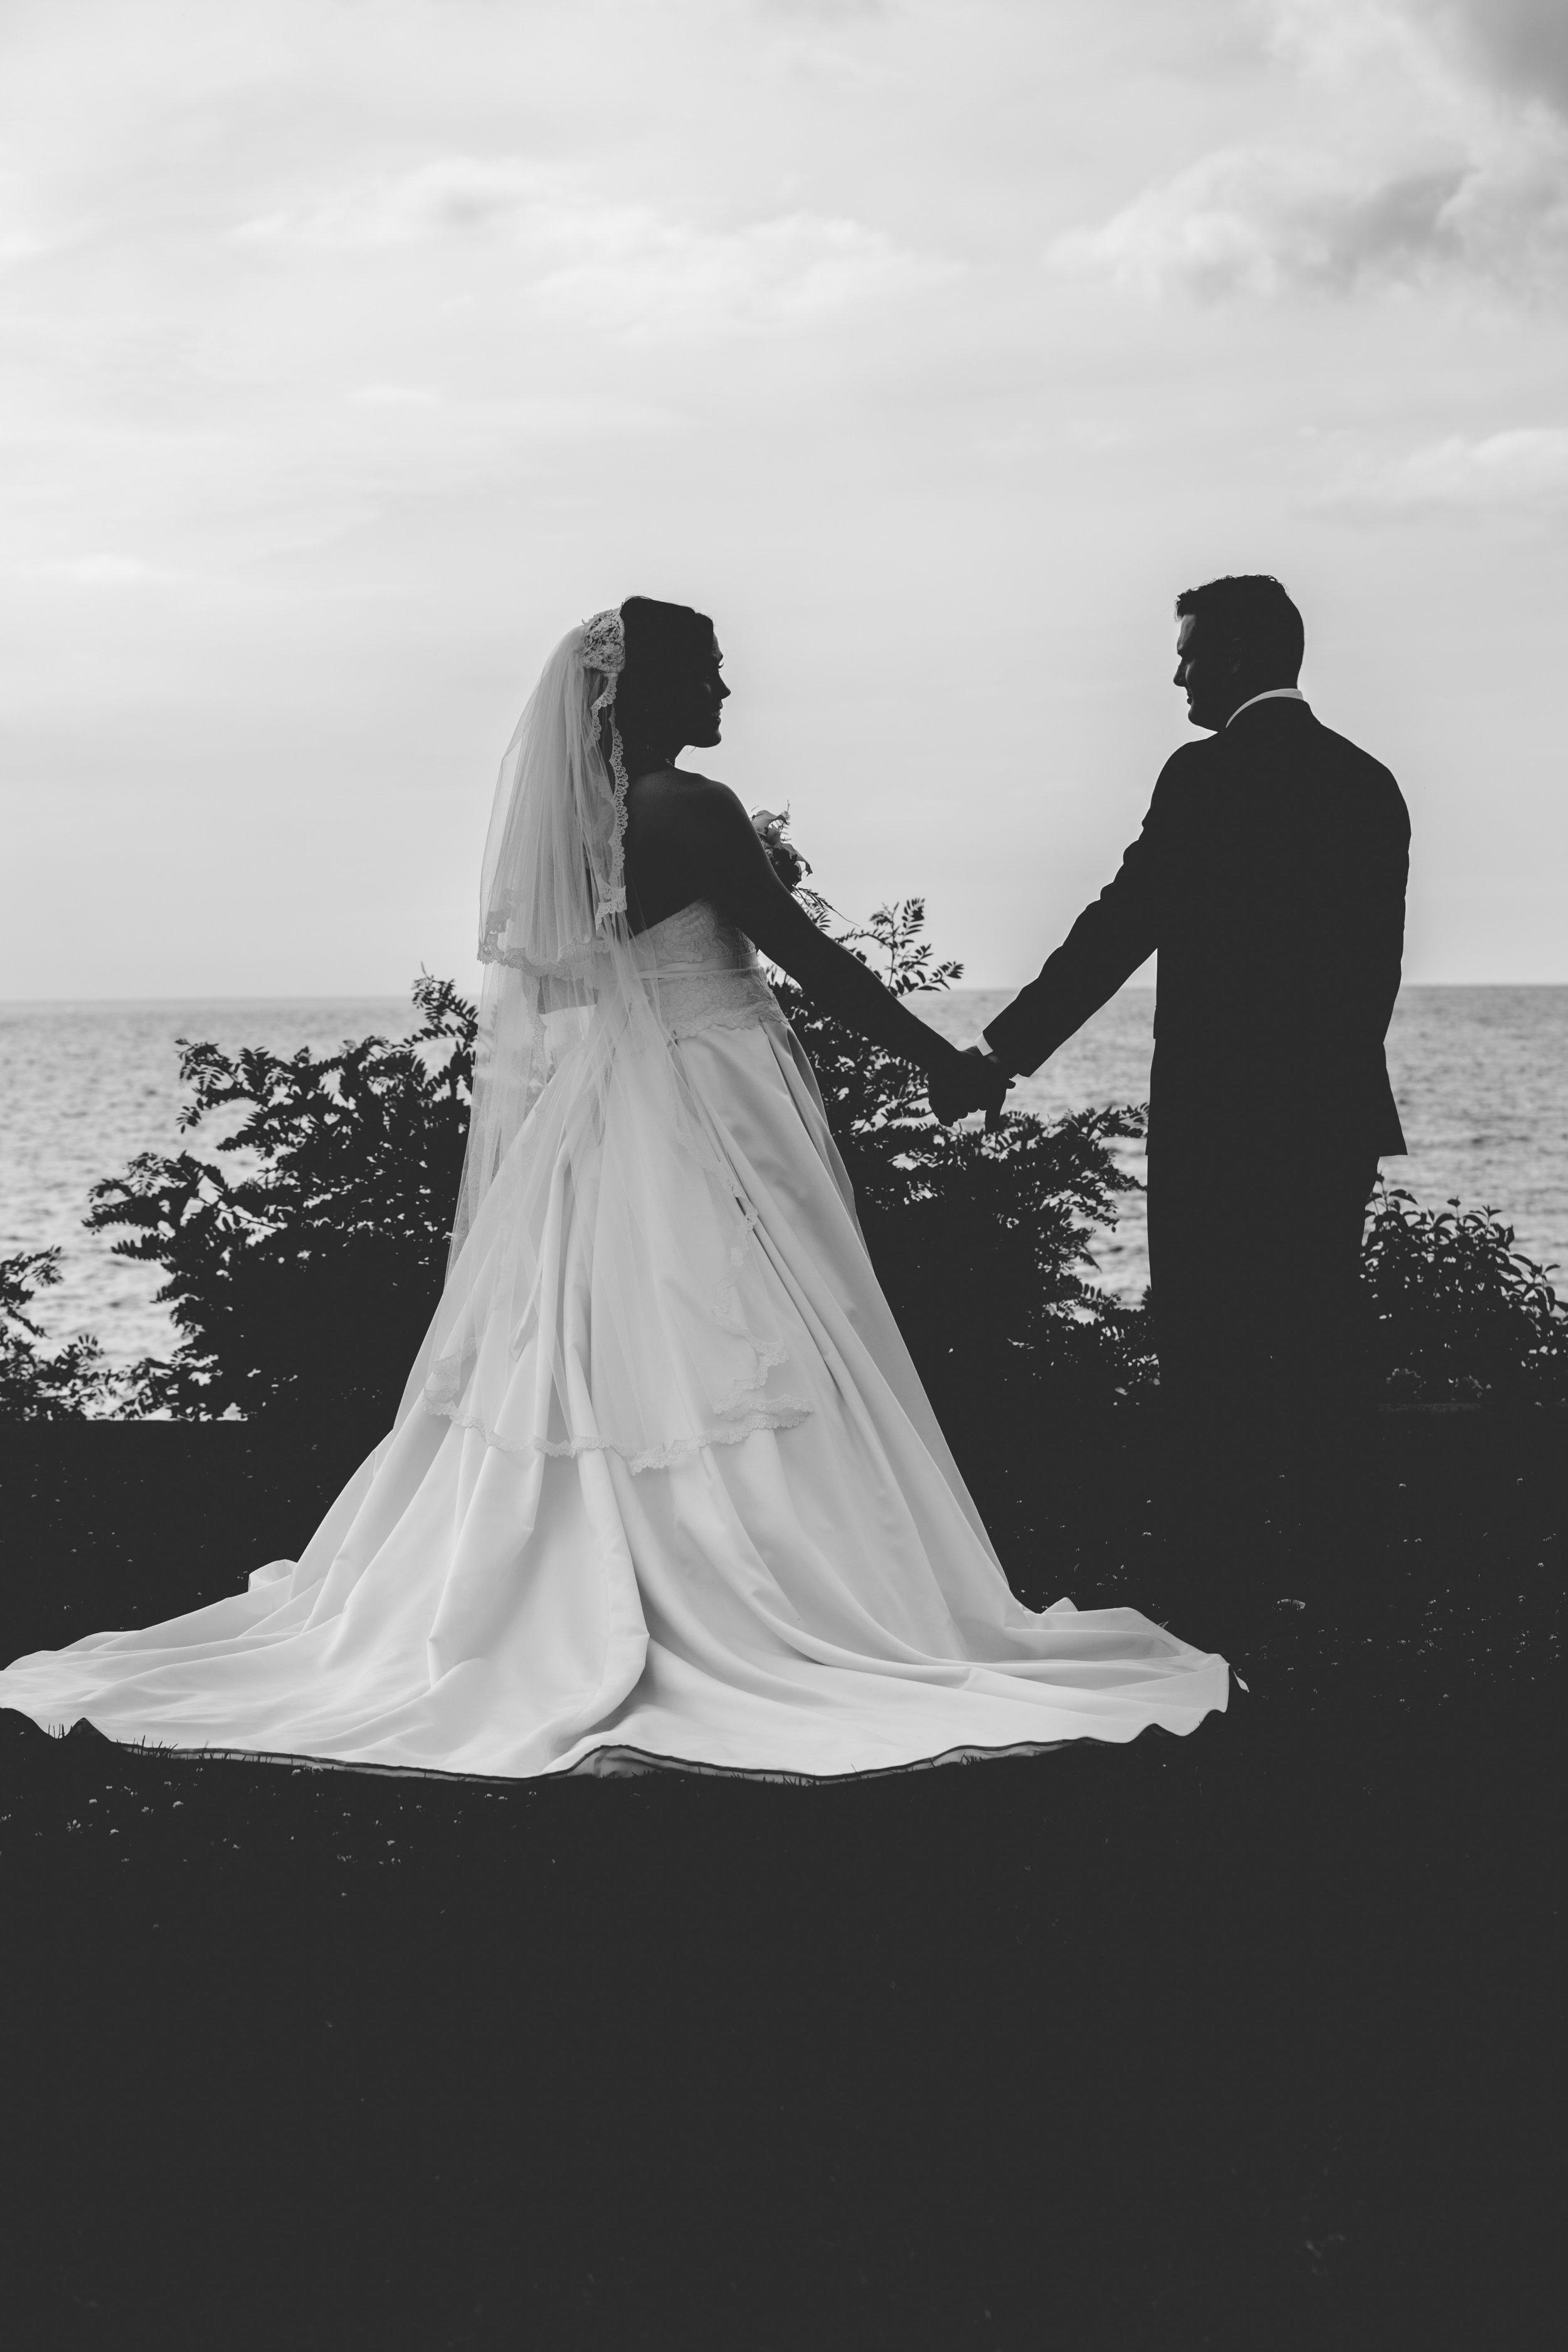 Black and white wedding silhouette photo.